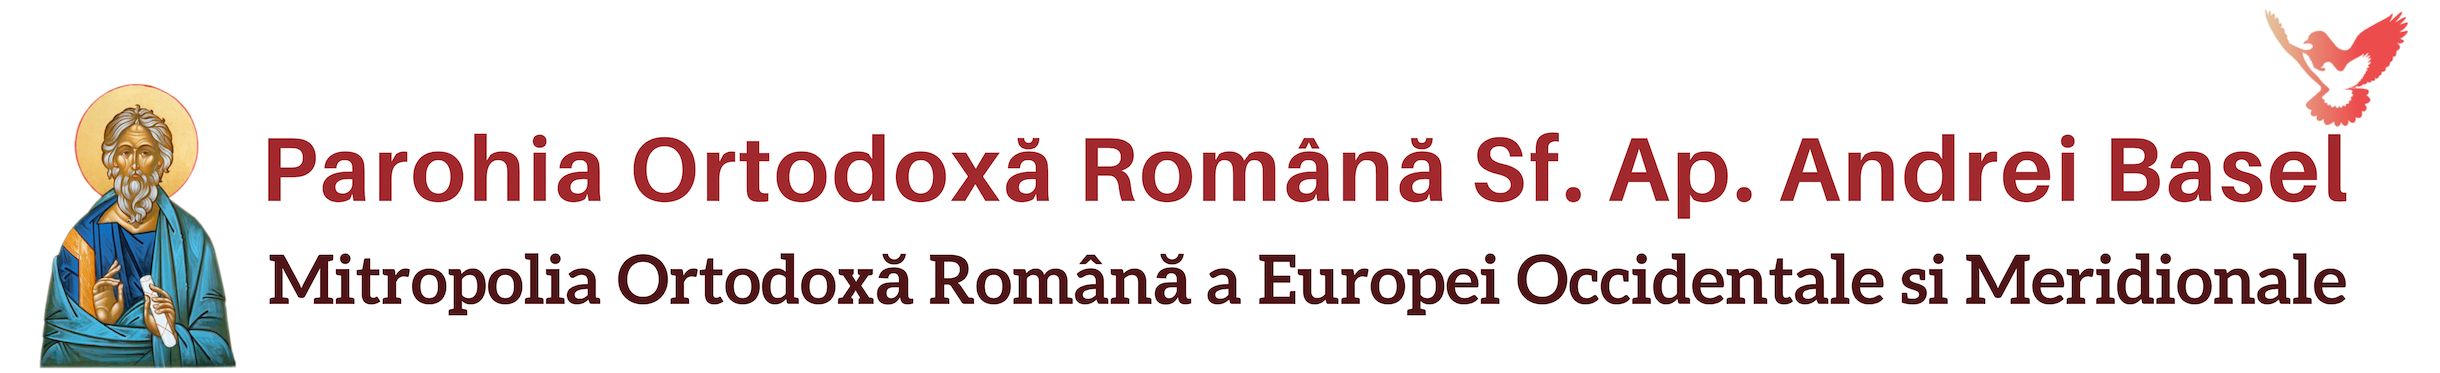 Parohia Ortodoxă Română Sf. Ap. Andrei Basel